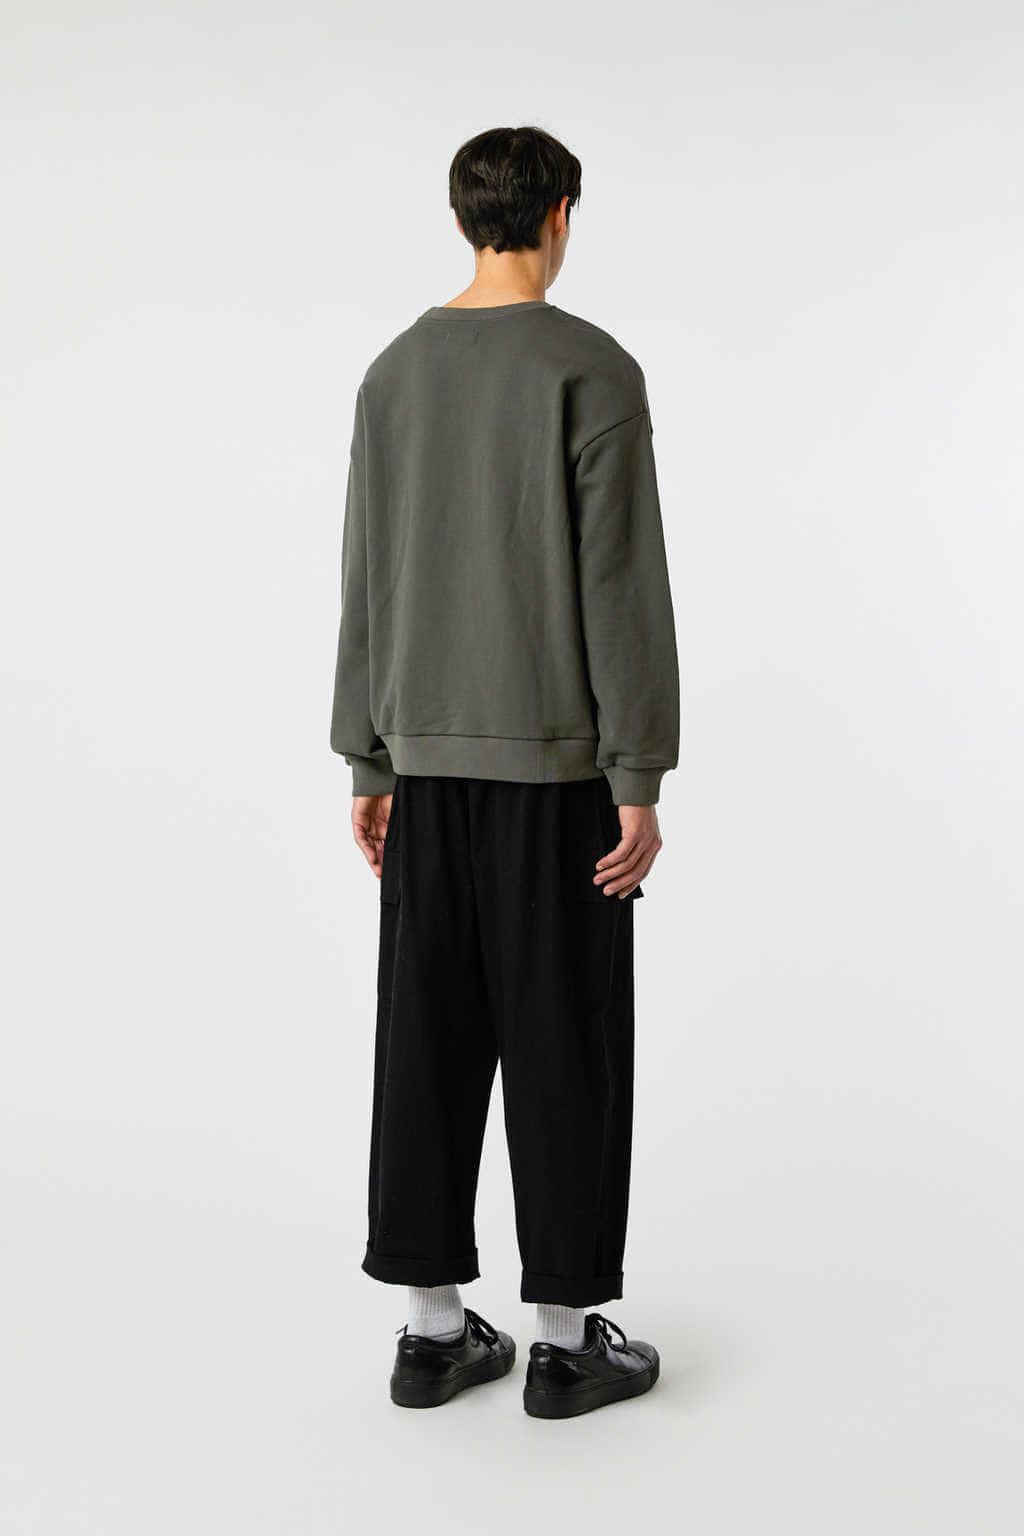 Sweatshirt 3138 Olive 10